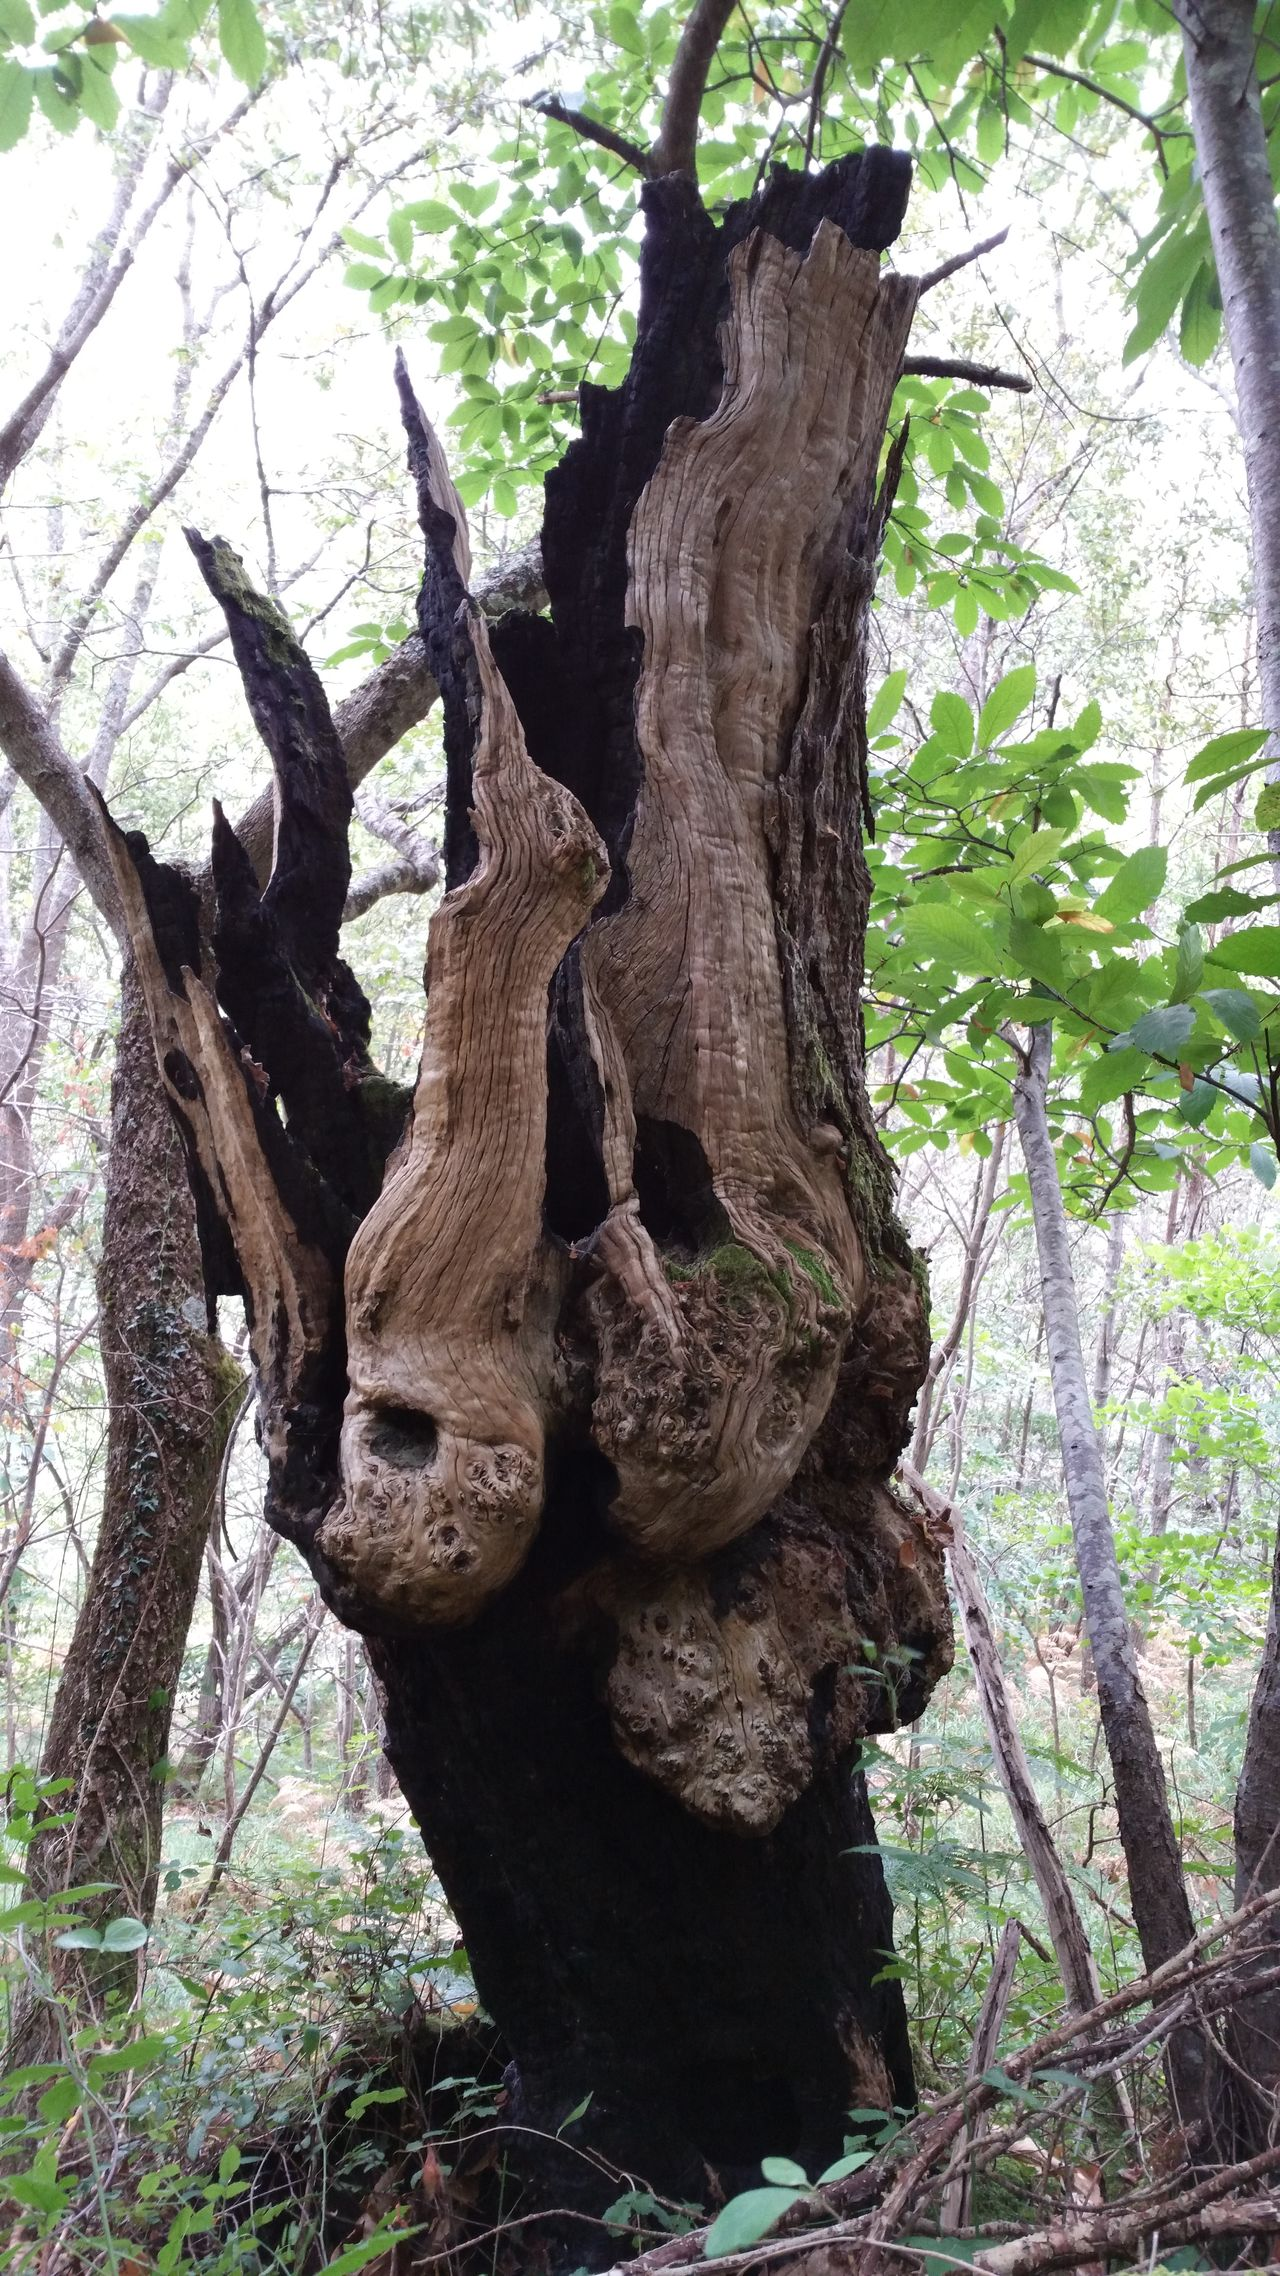 Tree Trunk Tree Dead Plant Tronco Terrorific Tree árbol Nature Otoño Bosque